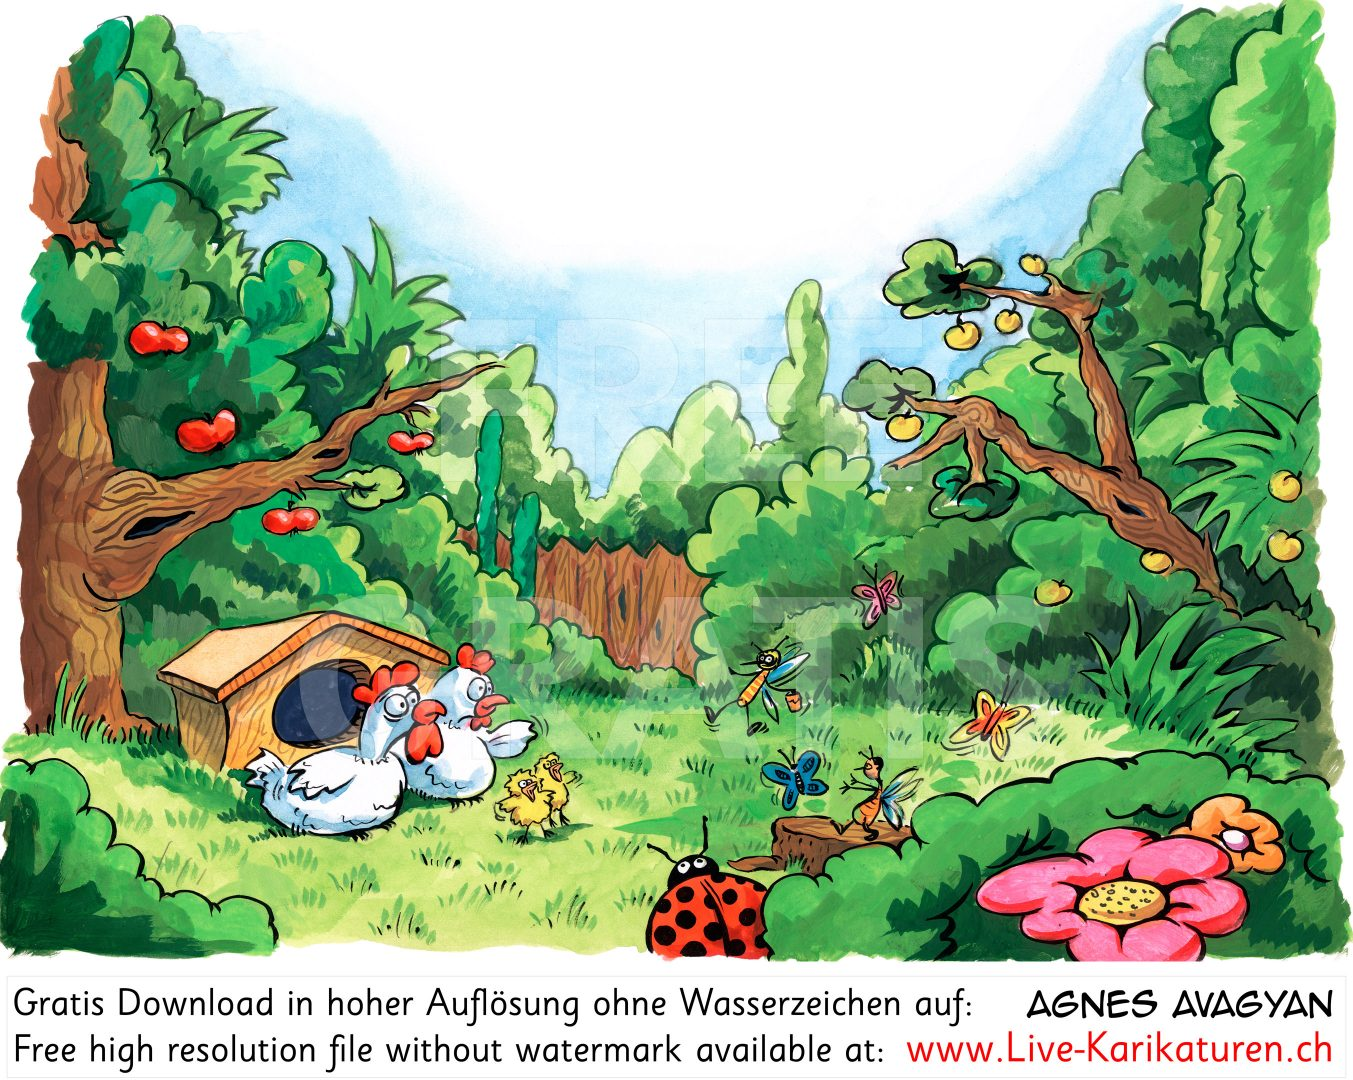 Garten Huehner Kinderbuch Idylle.